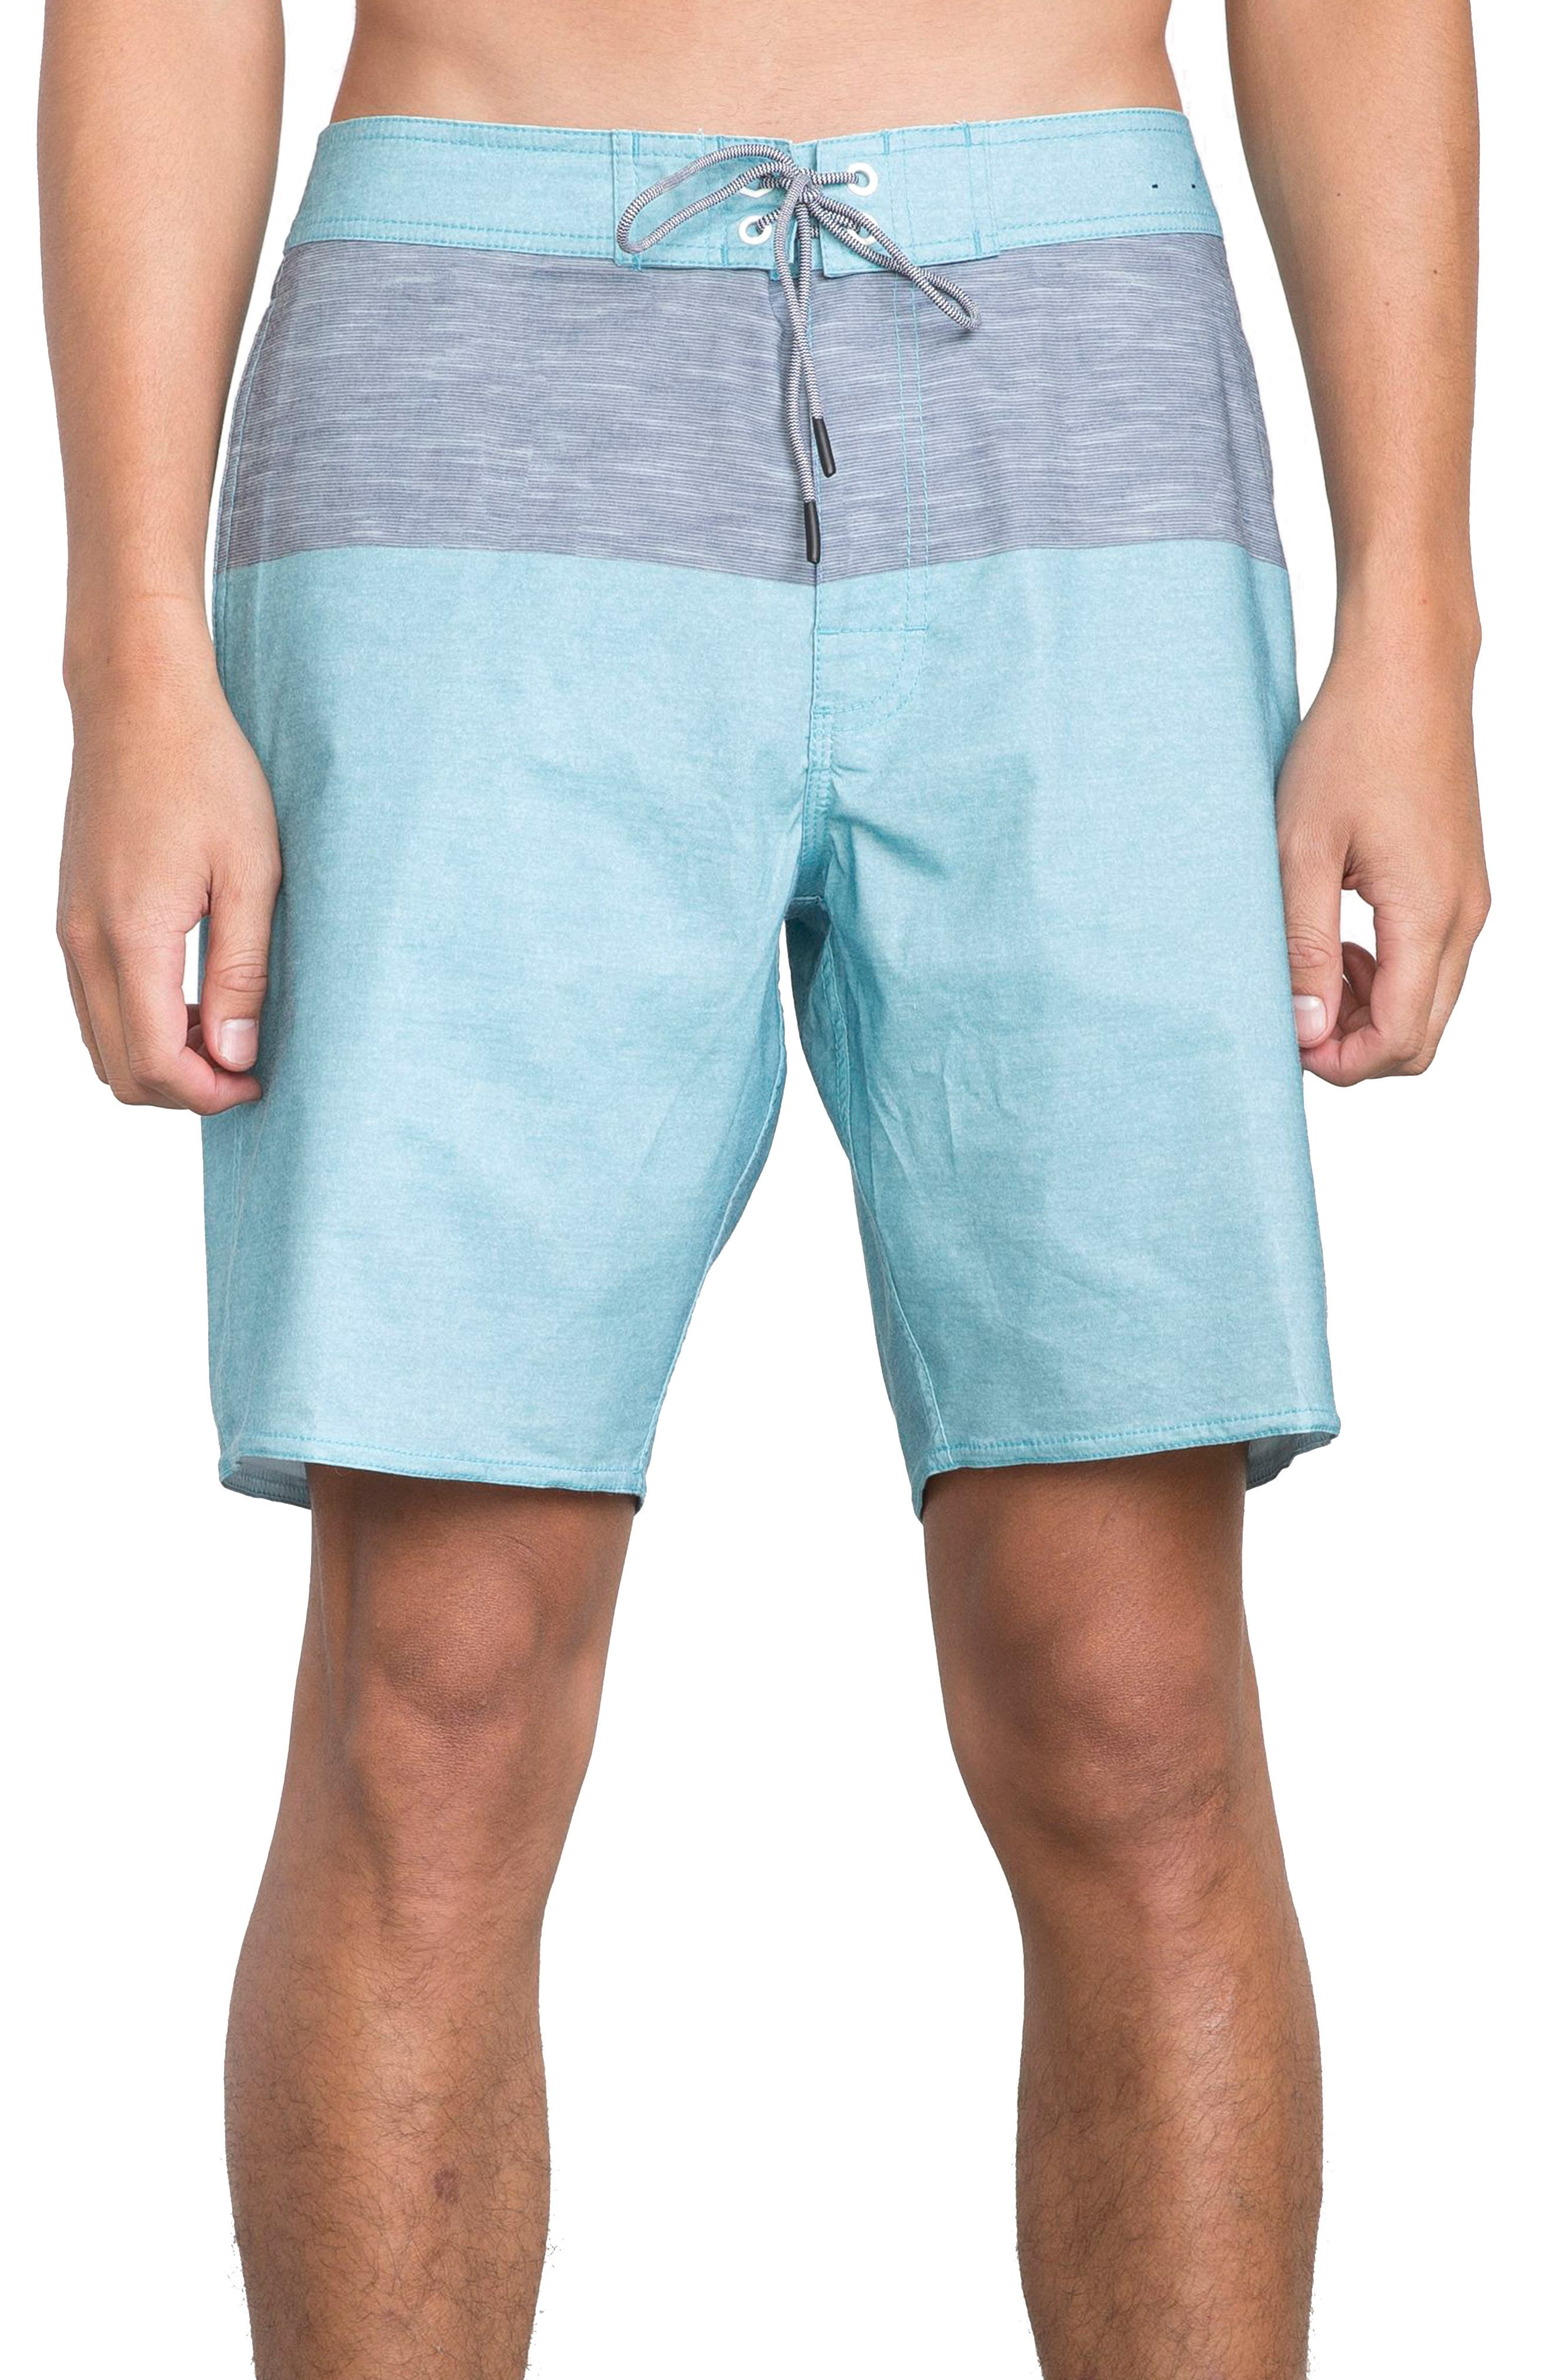 Gothard Board Shorts,                         Main,                         color, MAUI BLUE